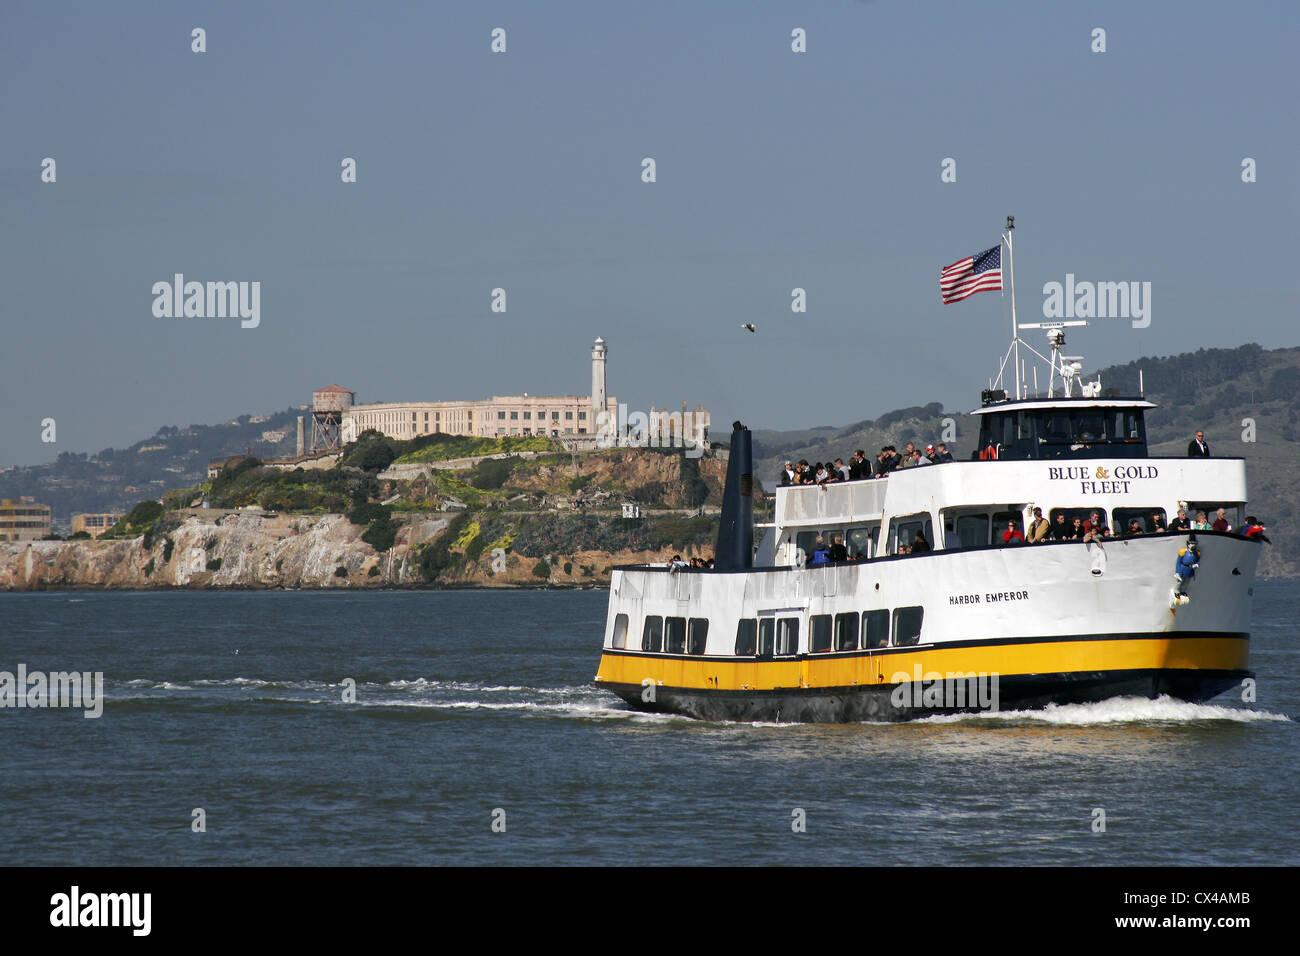 The Alcatraz ferry returns to Fisherman's Wharf. San Francisco, California, USA. - Stock Image